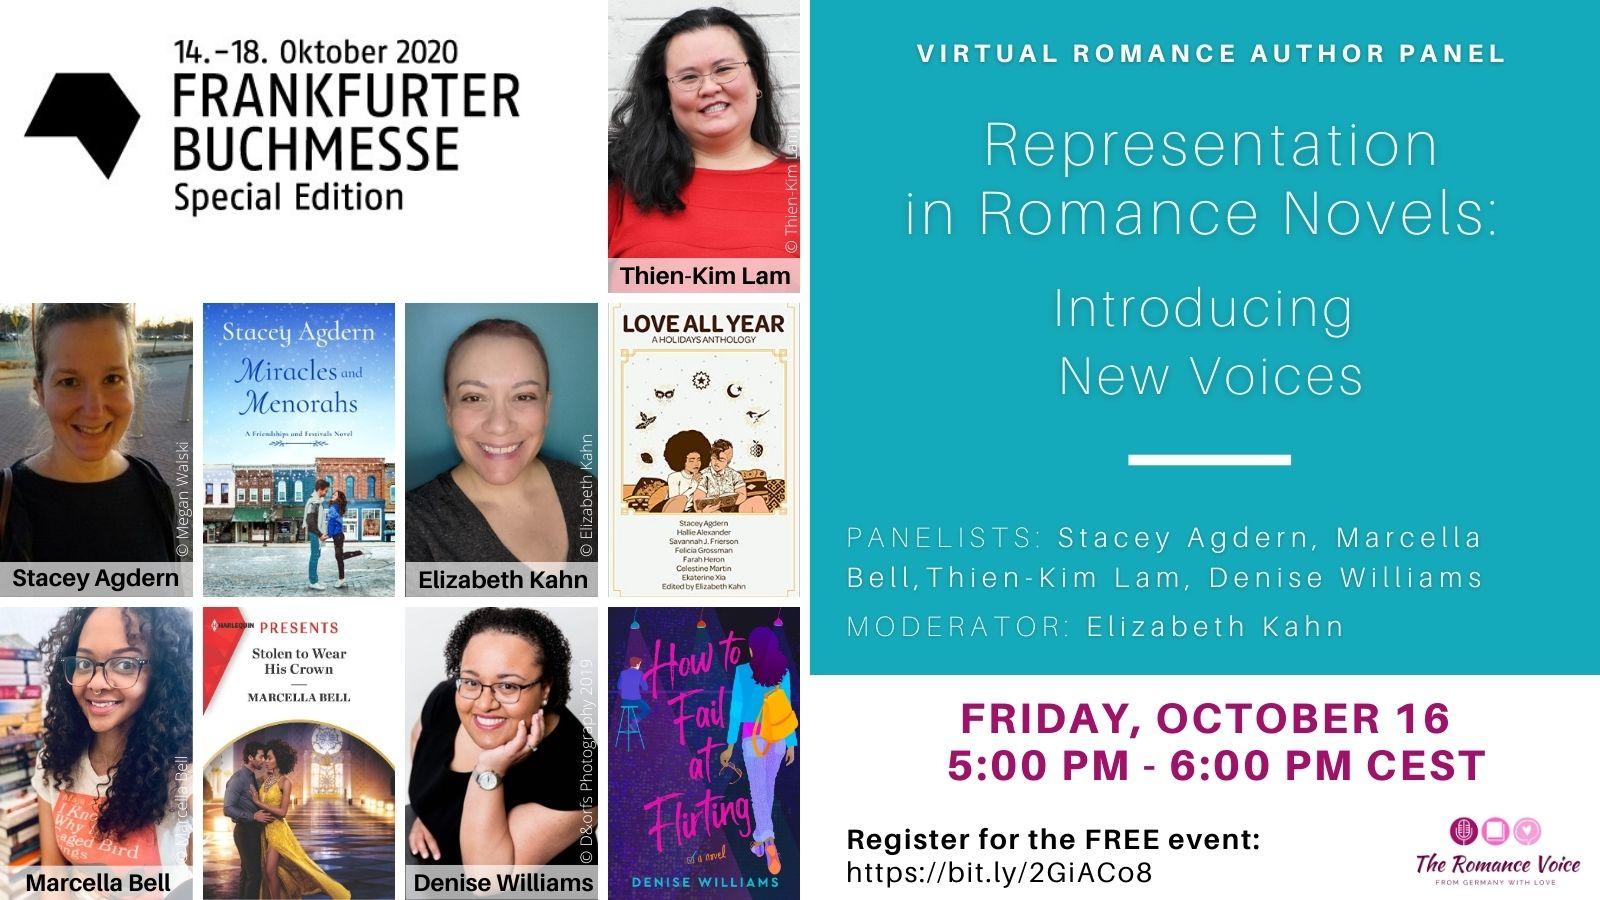 Frankfurt Book Fair 2020 Panel: Representation in Romance Novels: Introducing New Voices